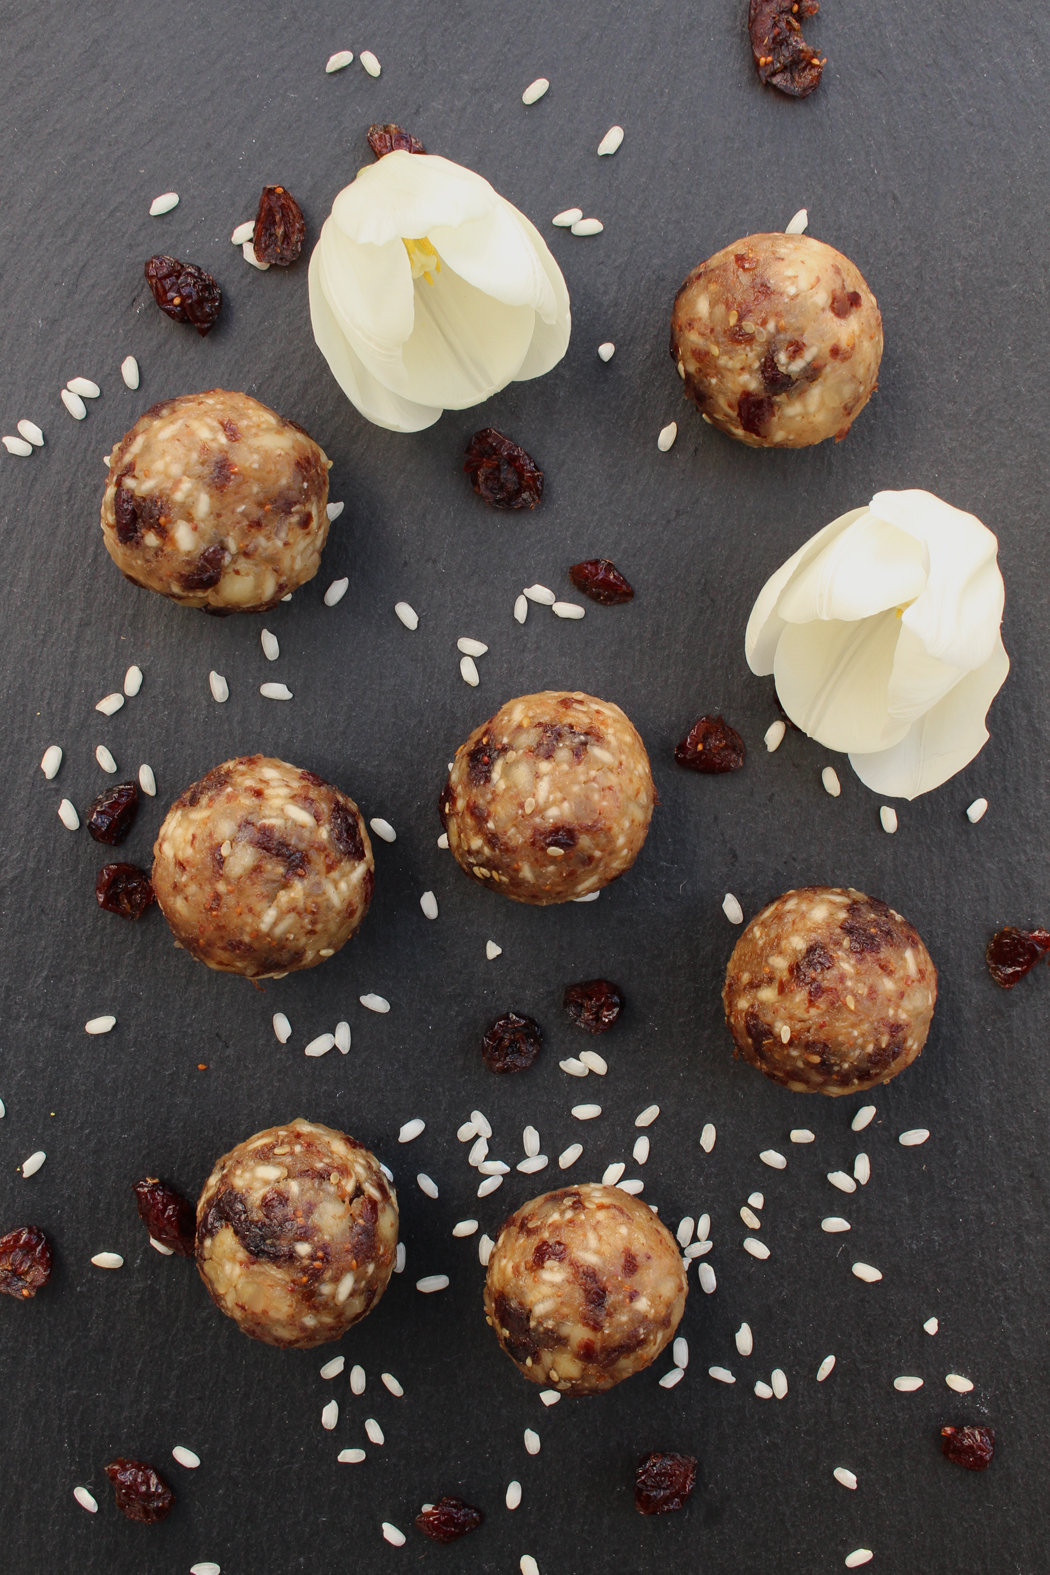 macadamia cranberry balls mit reis01 projekt gesund leben clean eating fitness entspannung. Black Bedroom Furniture Sets. Home Design Ideas